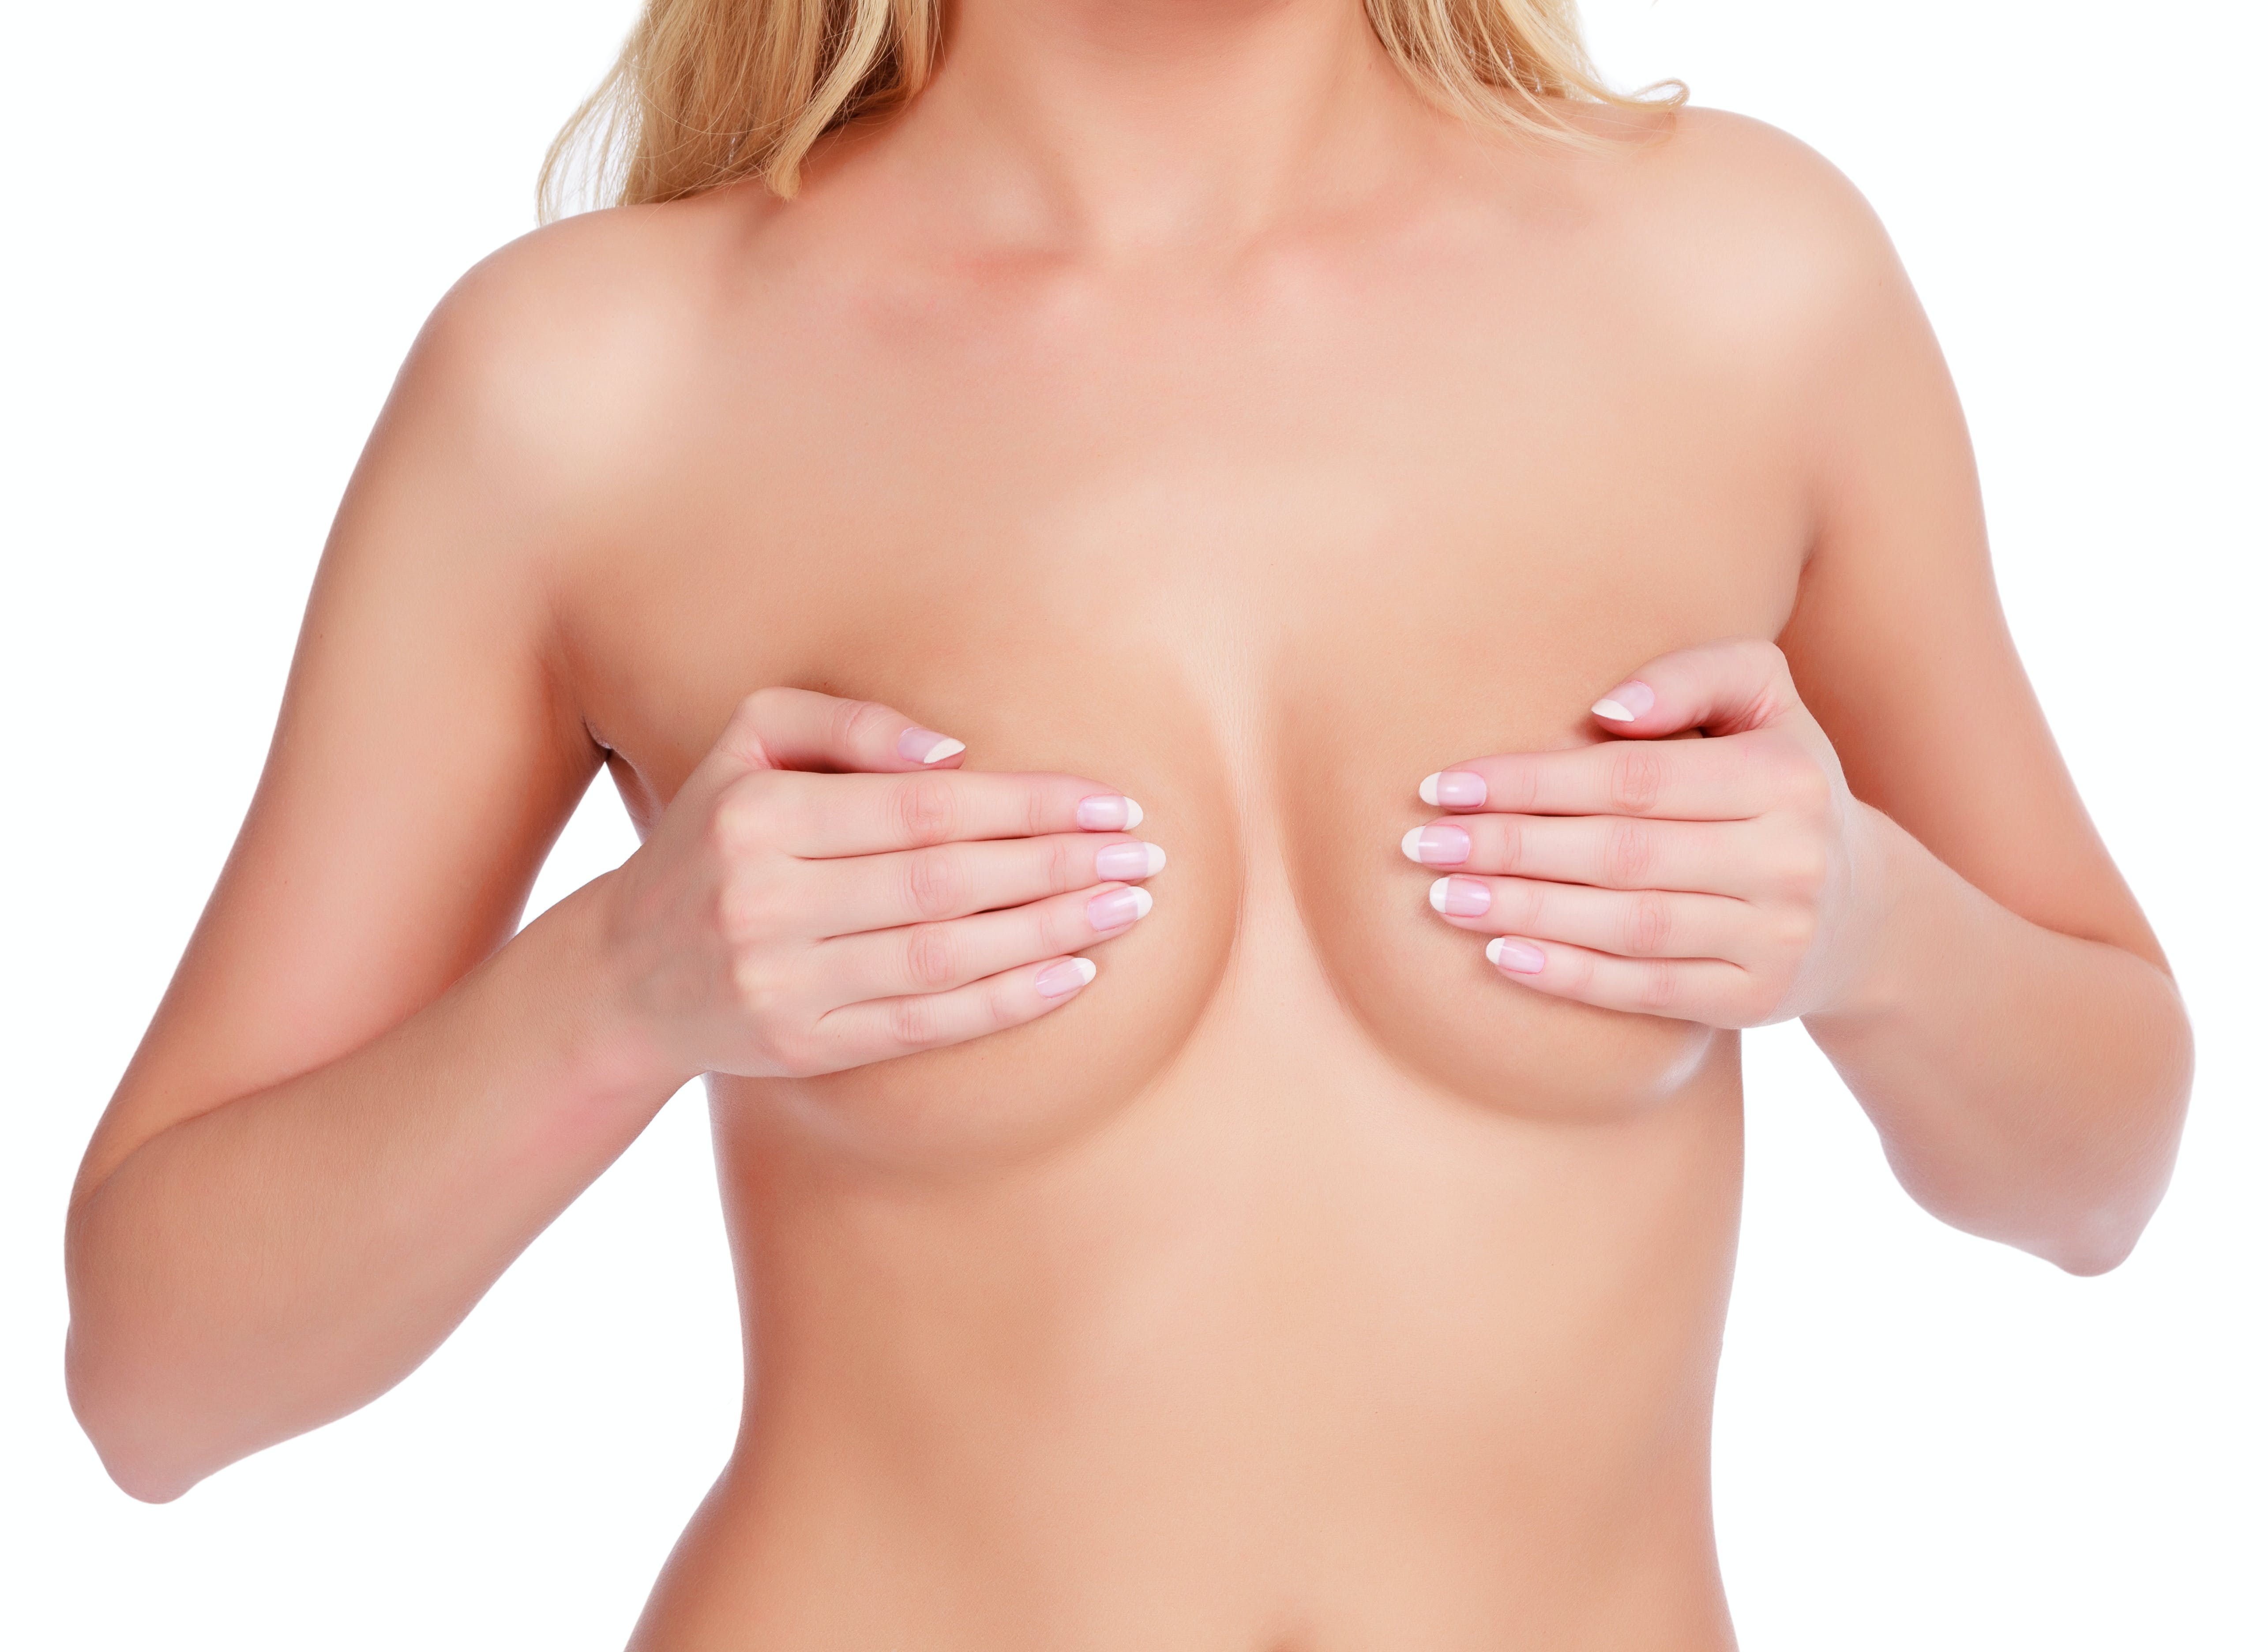 www gratis sex hvordan får du faste bryster